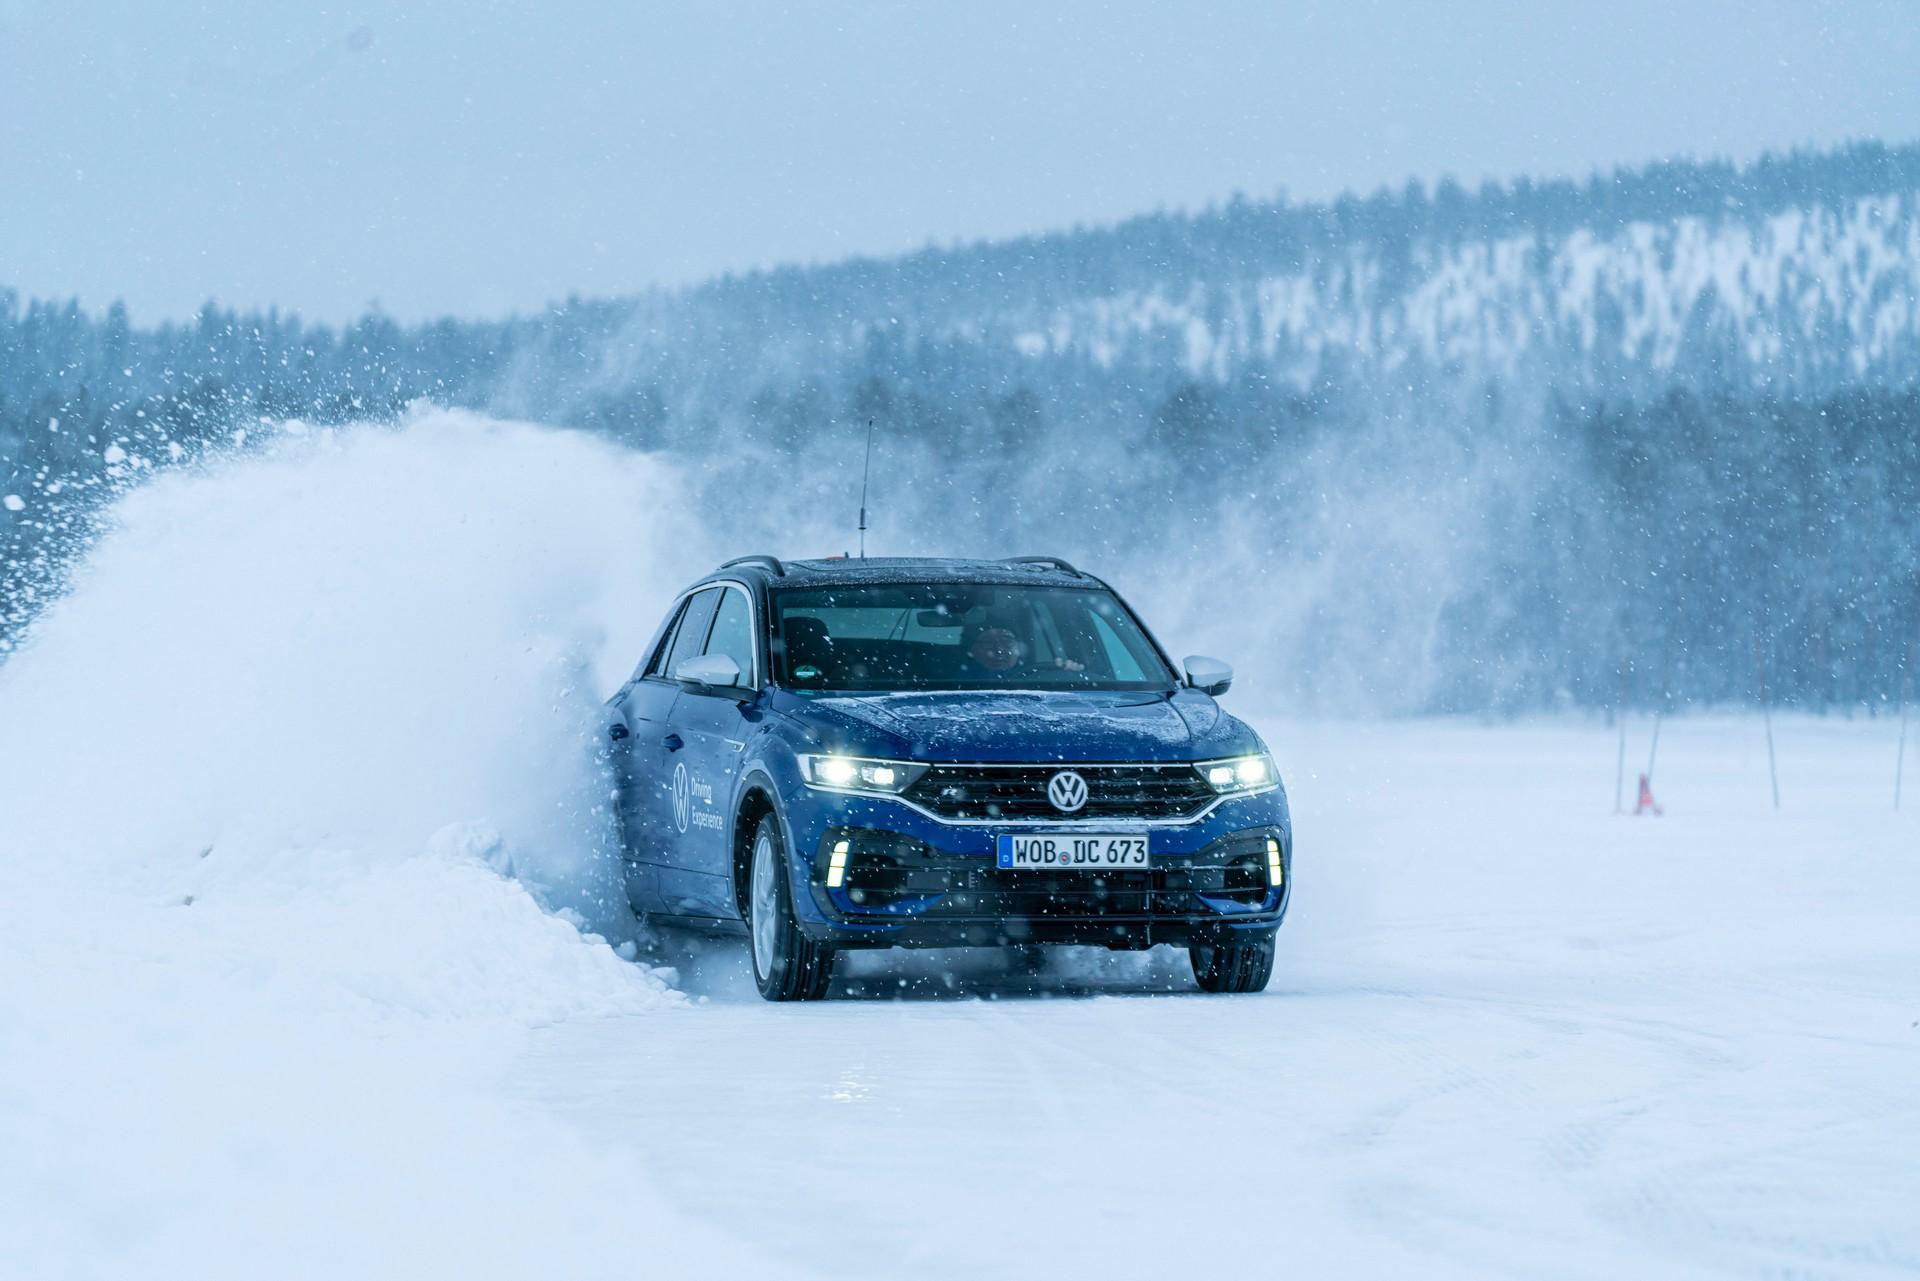 VW-GP-Ice-Race-2020-6